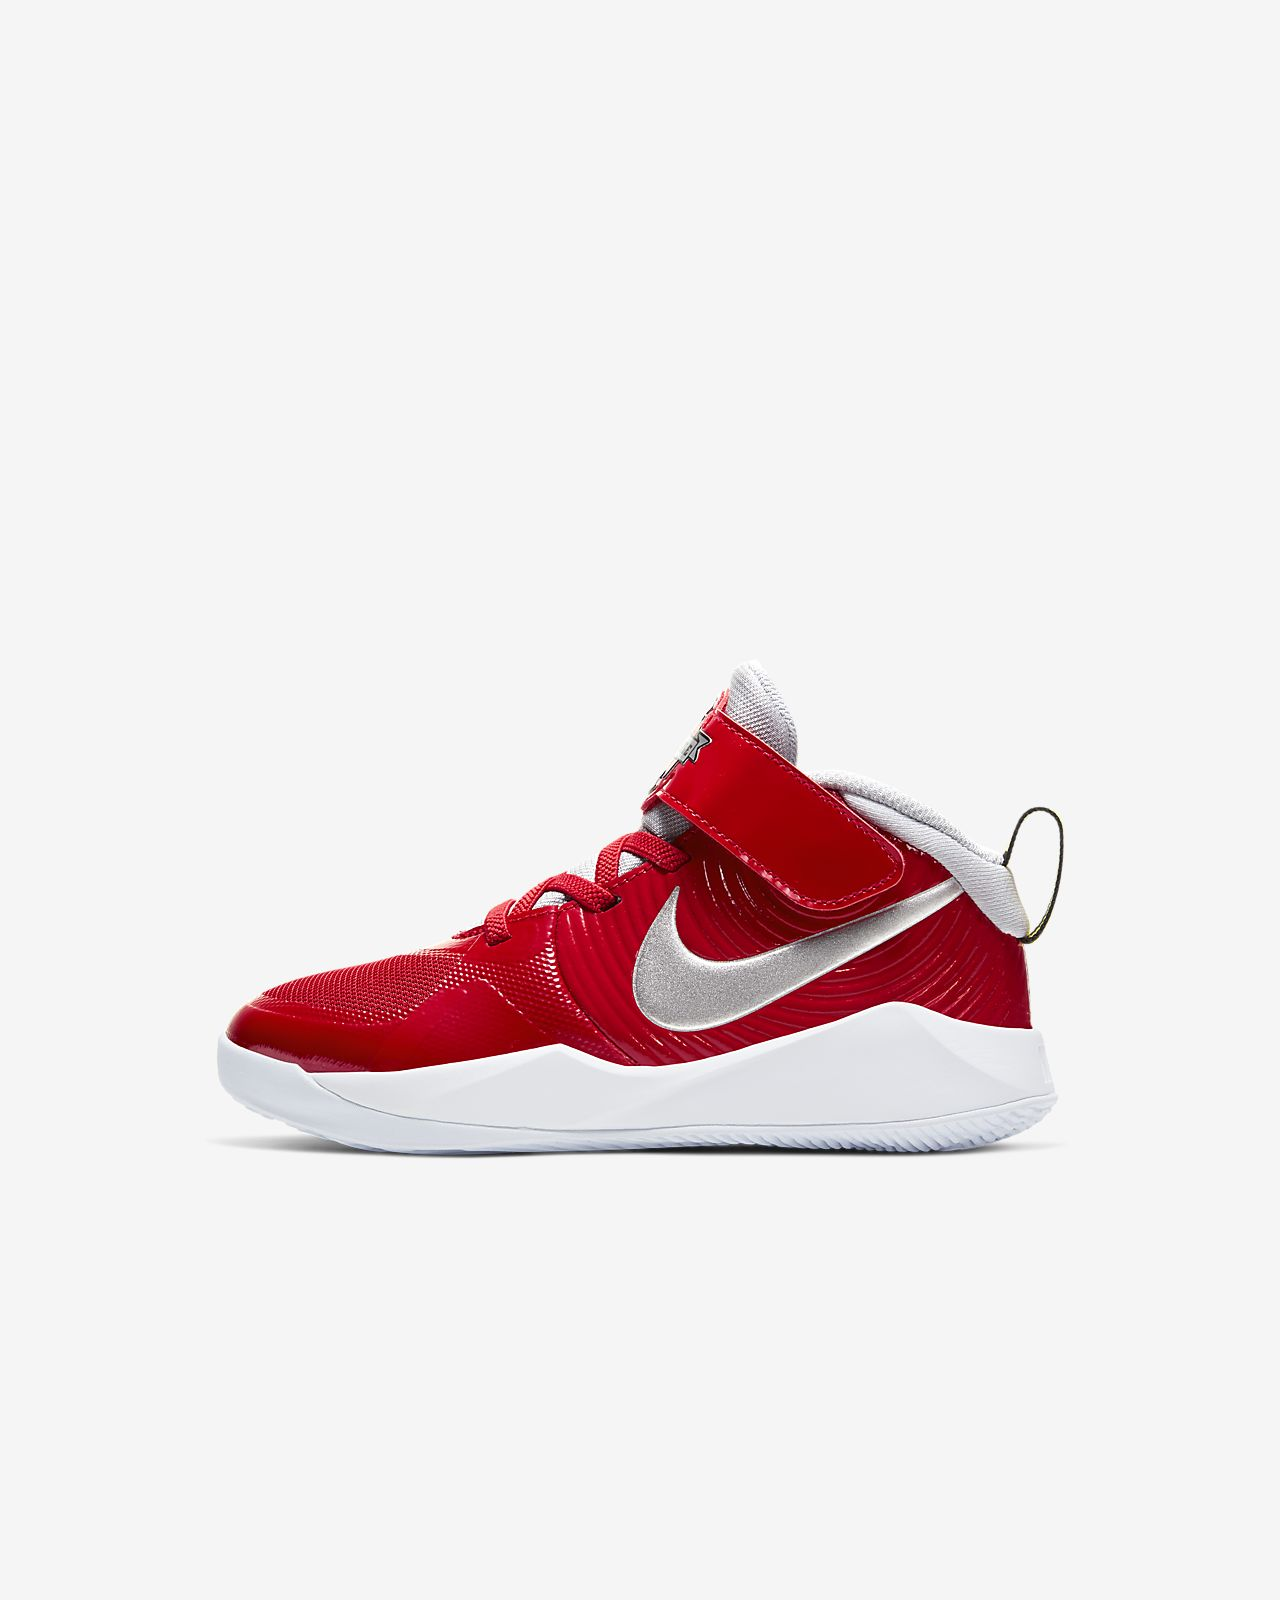 Nike Team Hustle D 9 Auto Younger Kids' Shoe